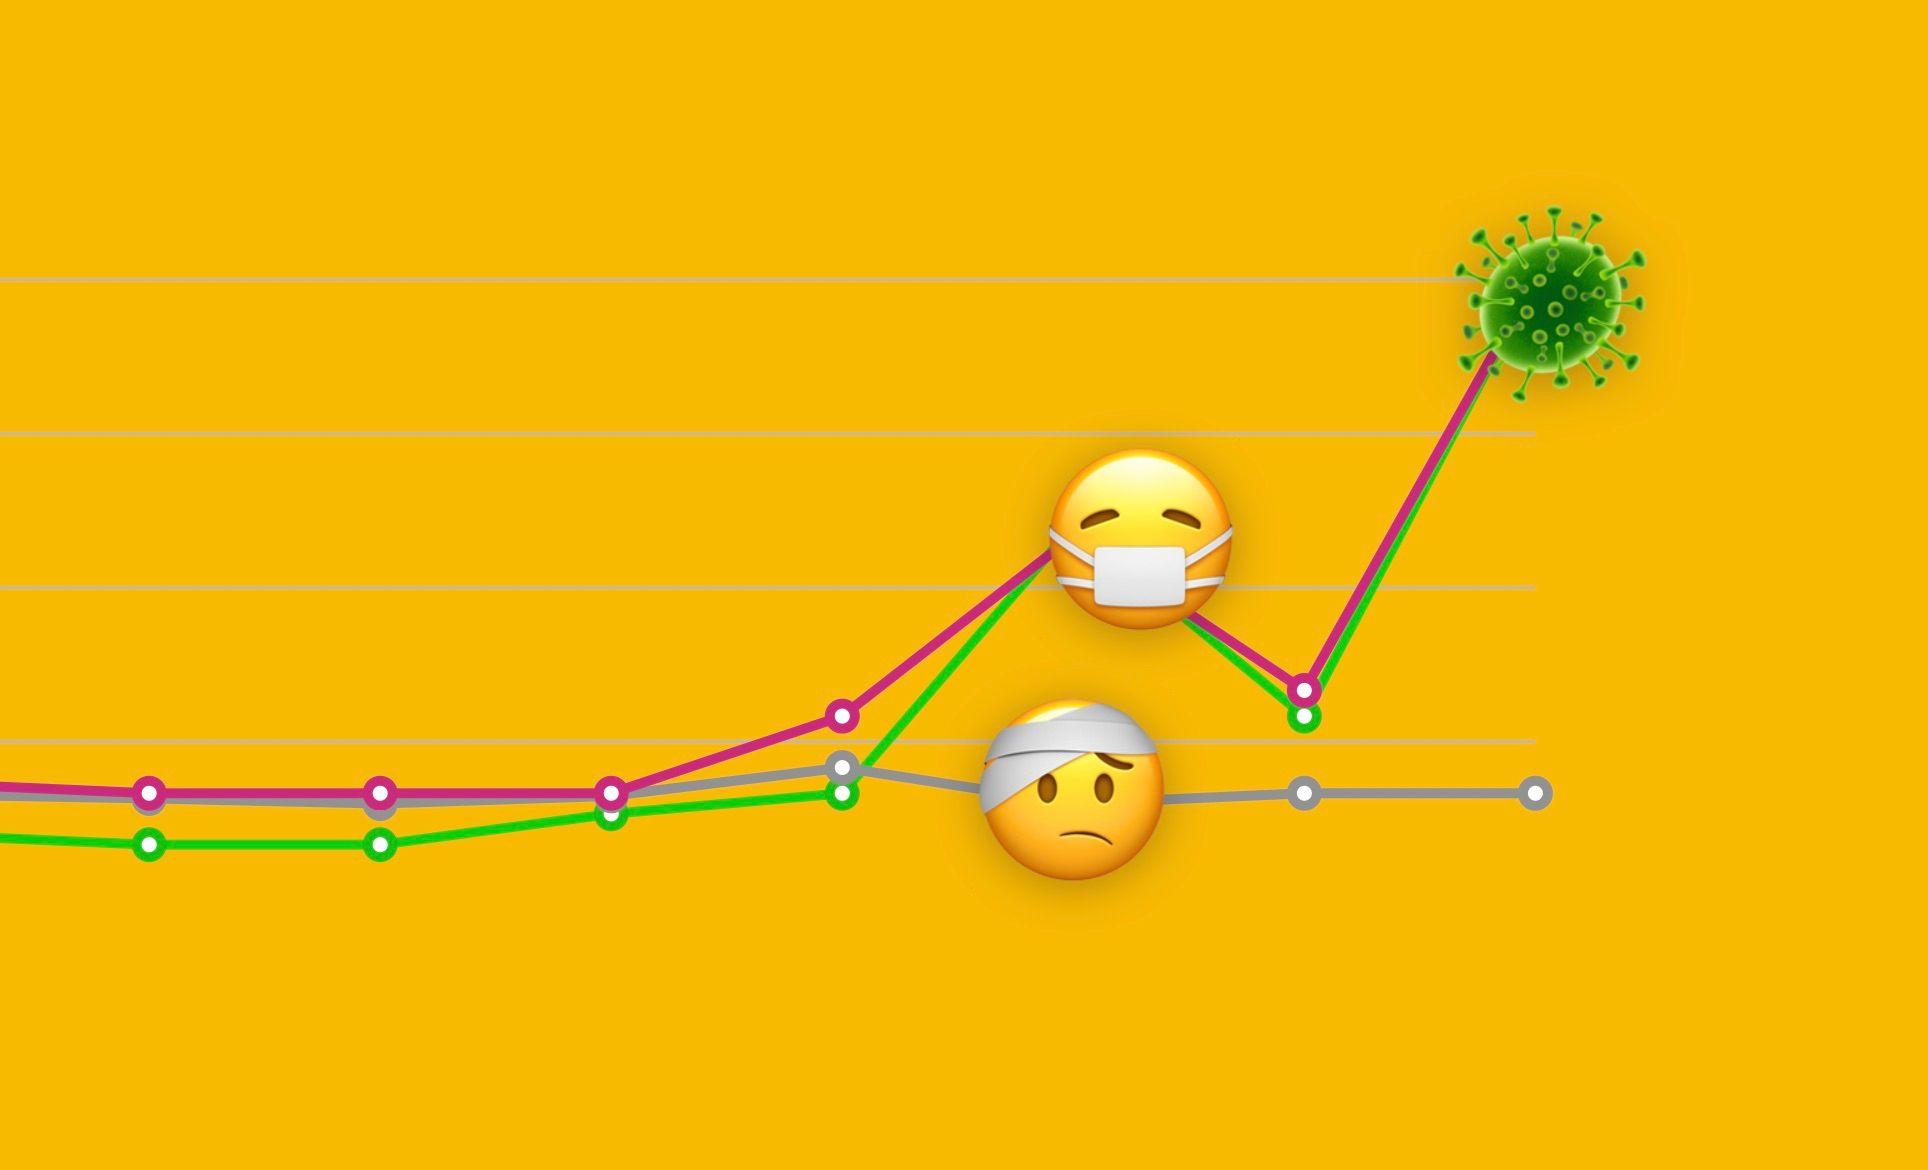 Spread of the Coronavirus Emoji